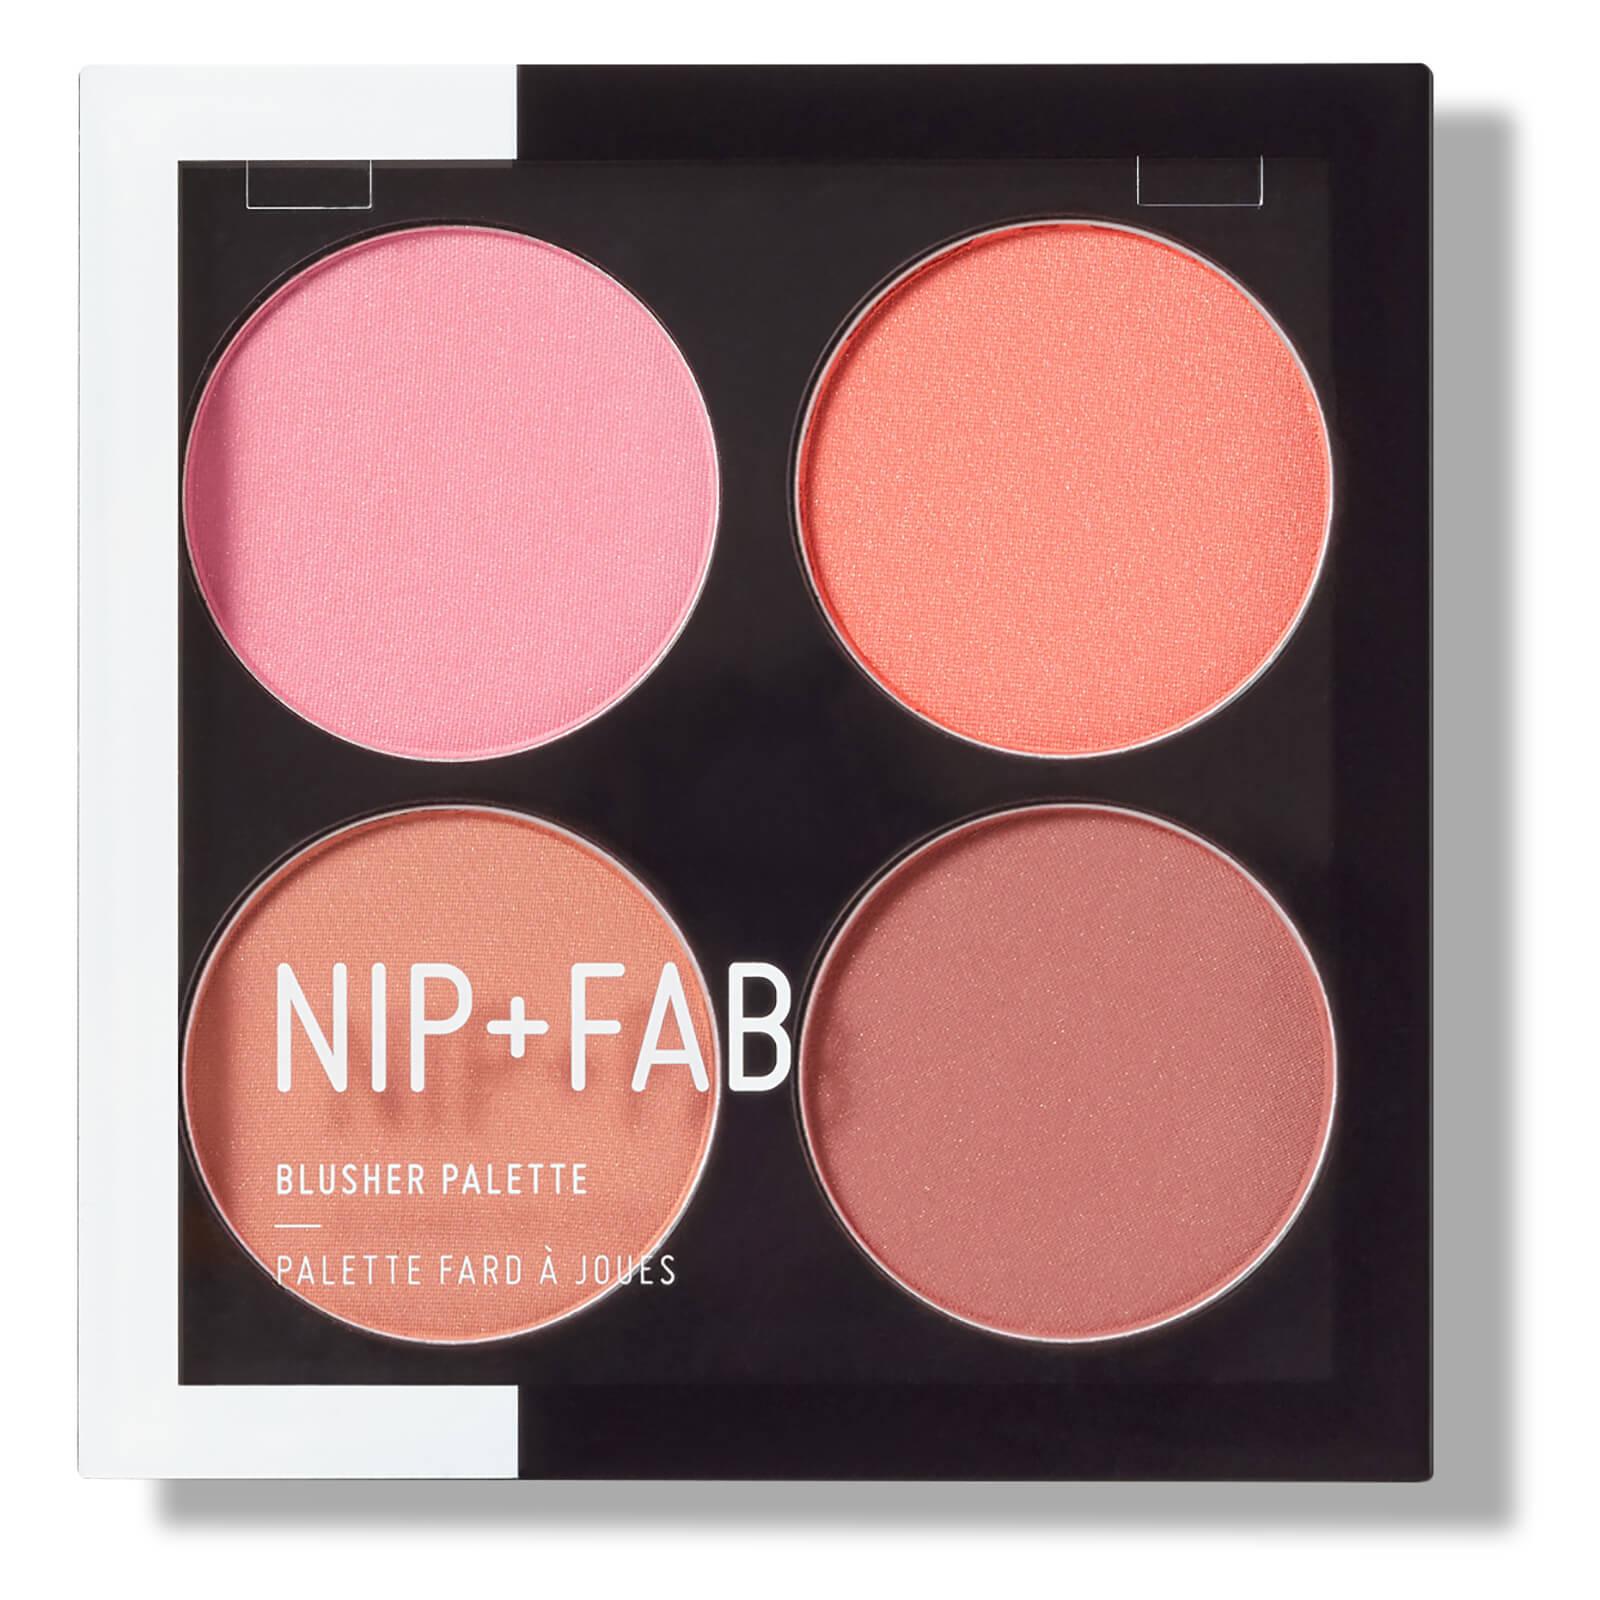 f5325671264 NIP+FAB Make Up Blusher Palette - Blushed 15.2g | Free Shipping |  Lookfantastic